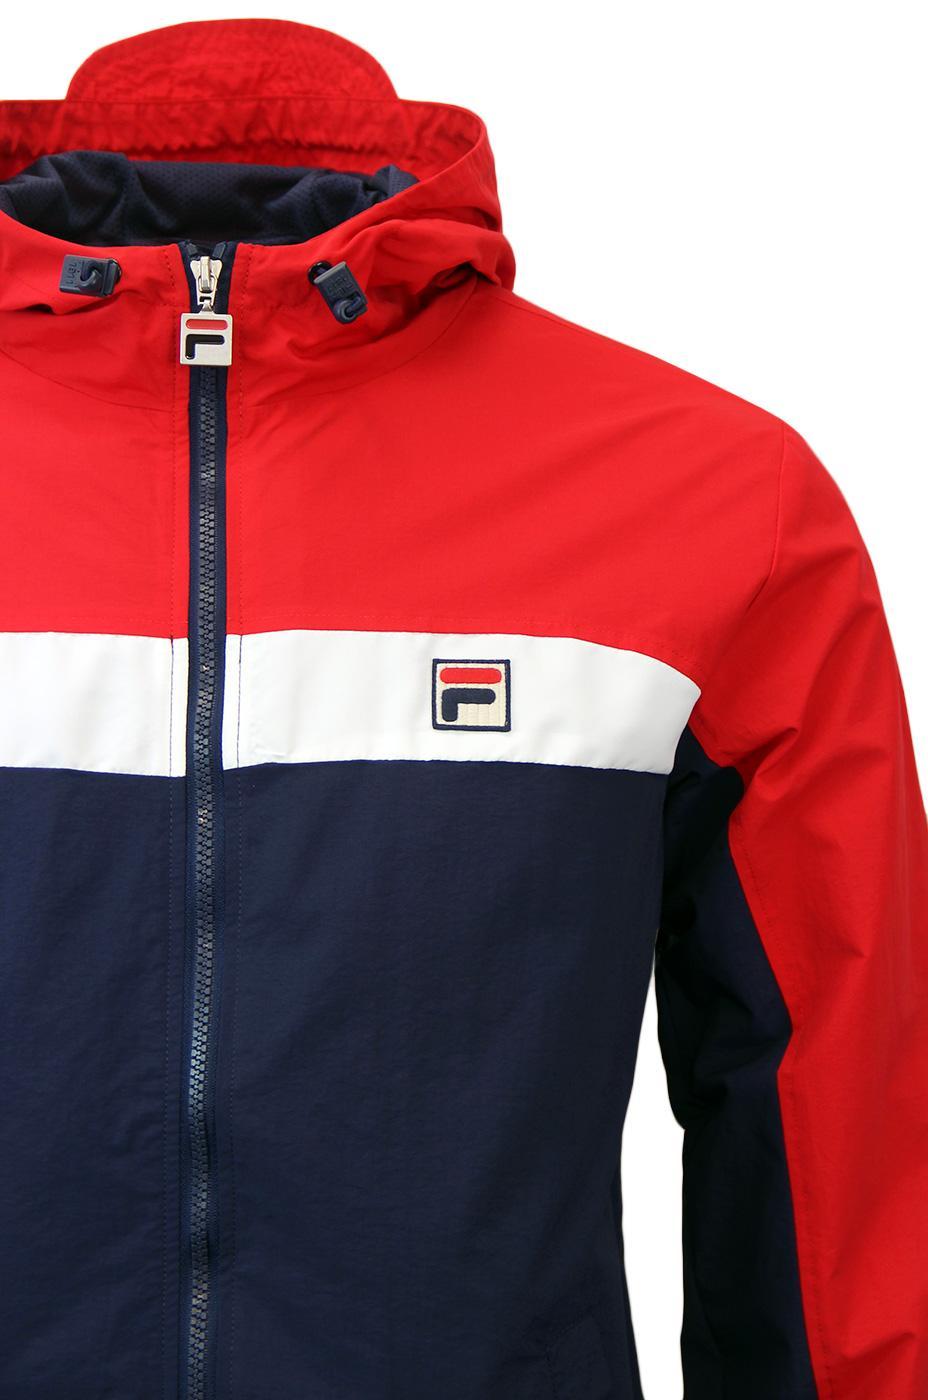 Clipper FILA VINTAGE Retro 70s Chest Stripe Jacket